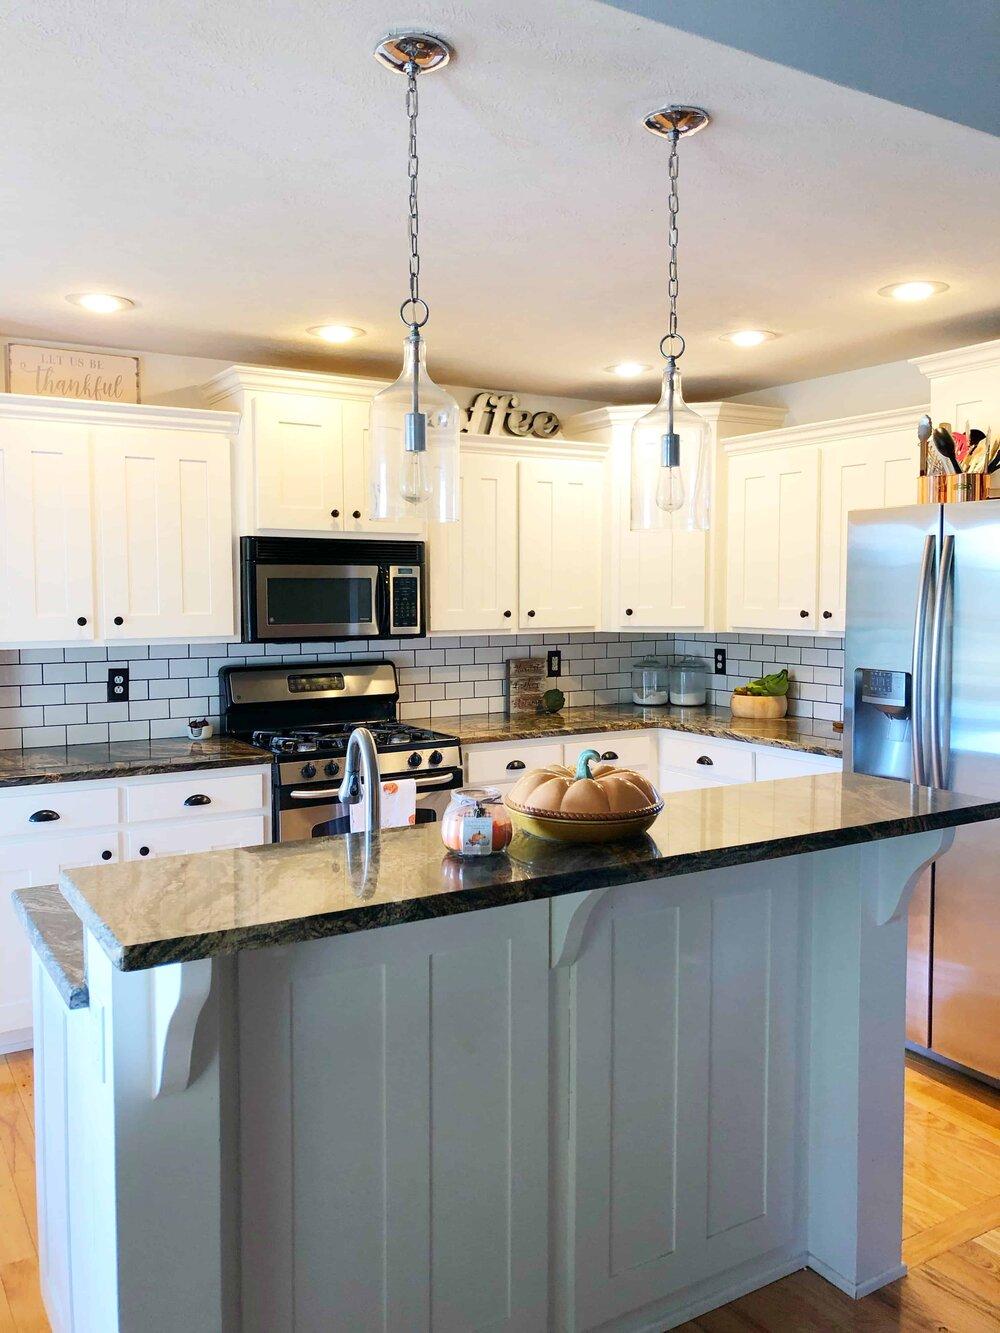 Missouri Girl Blog. DIY kitchen remodel.